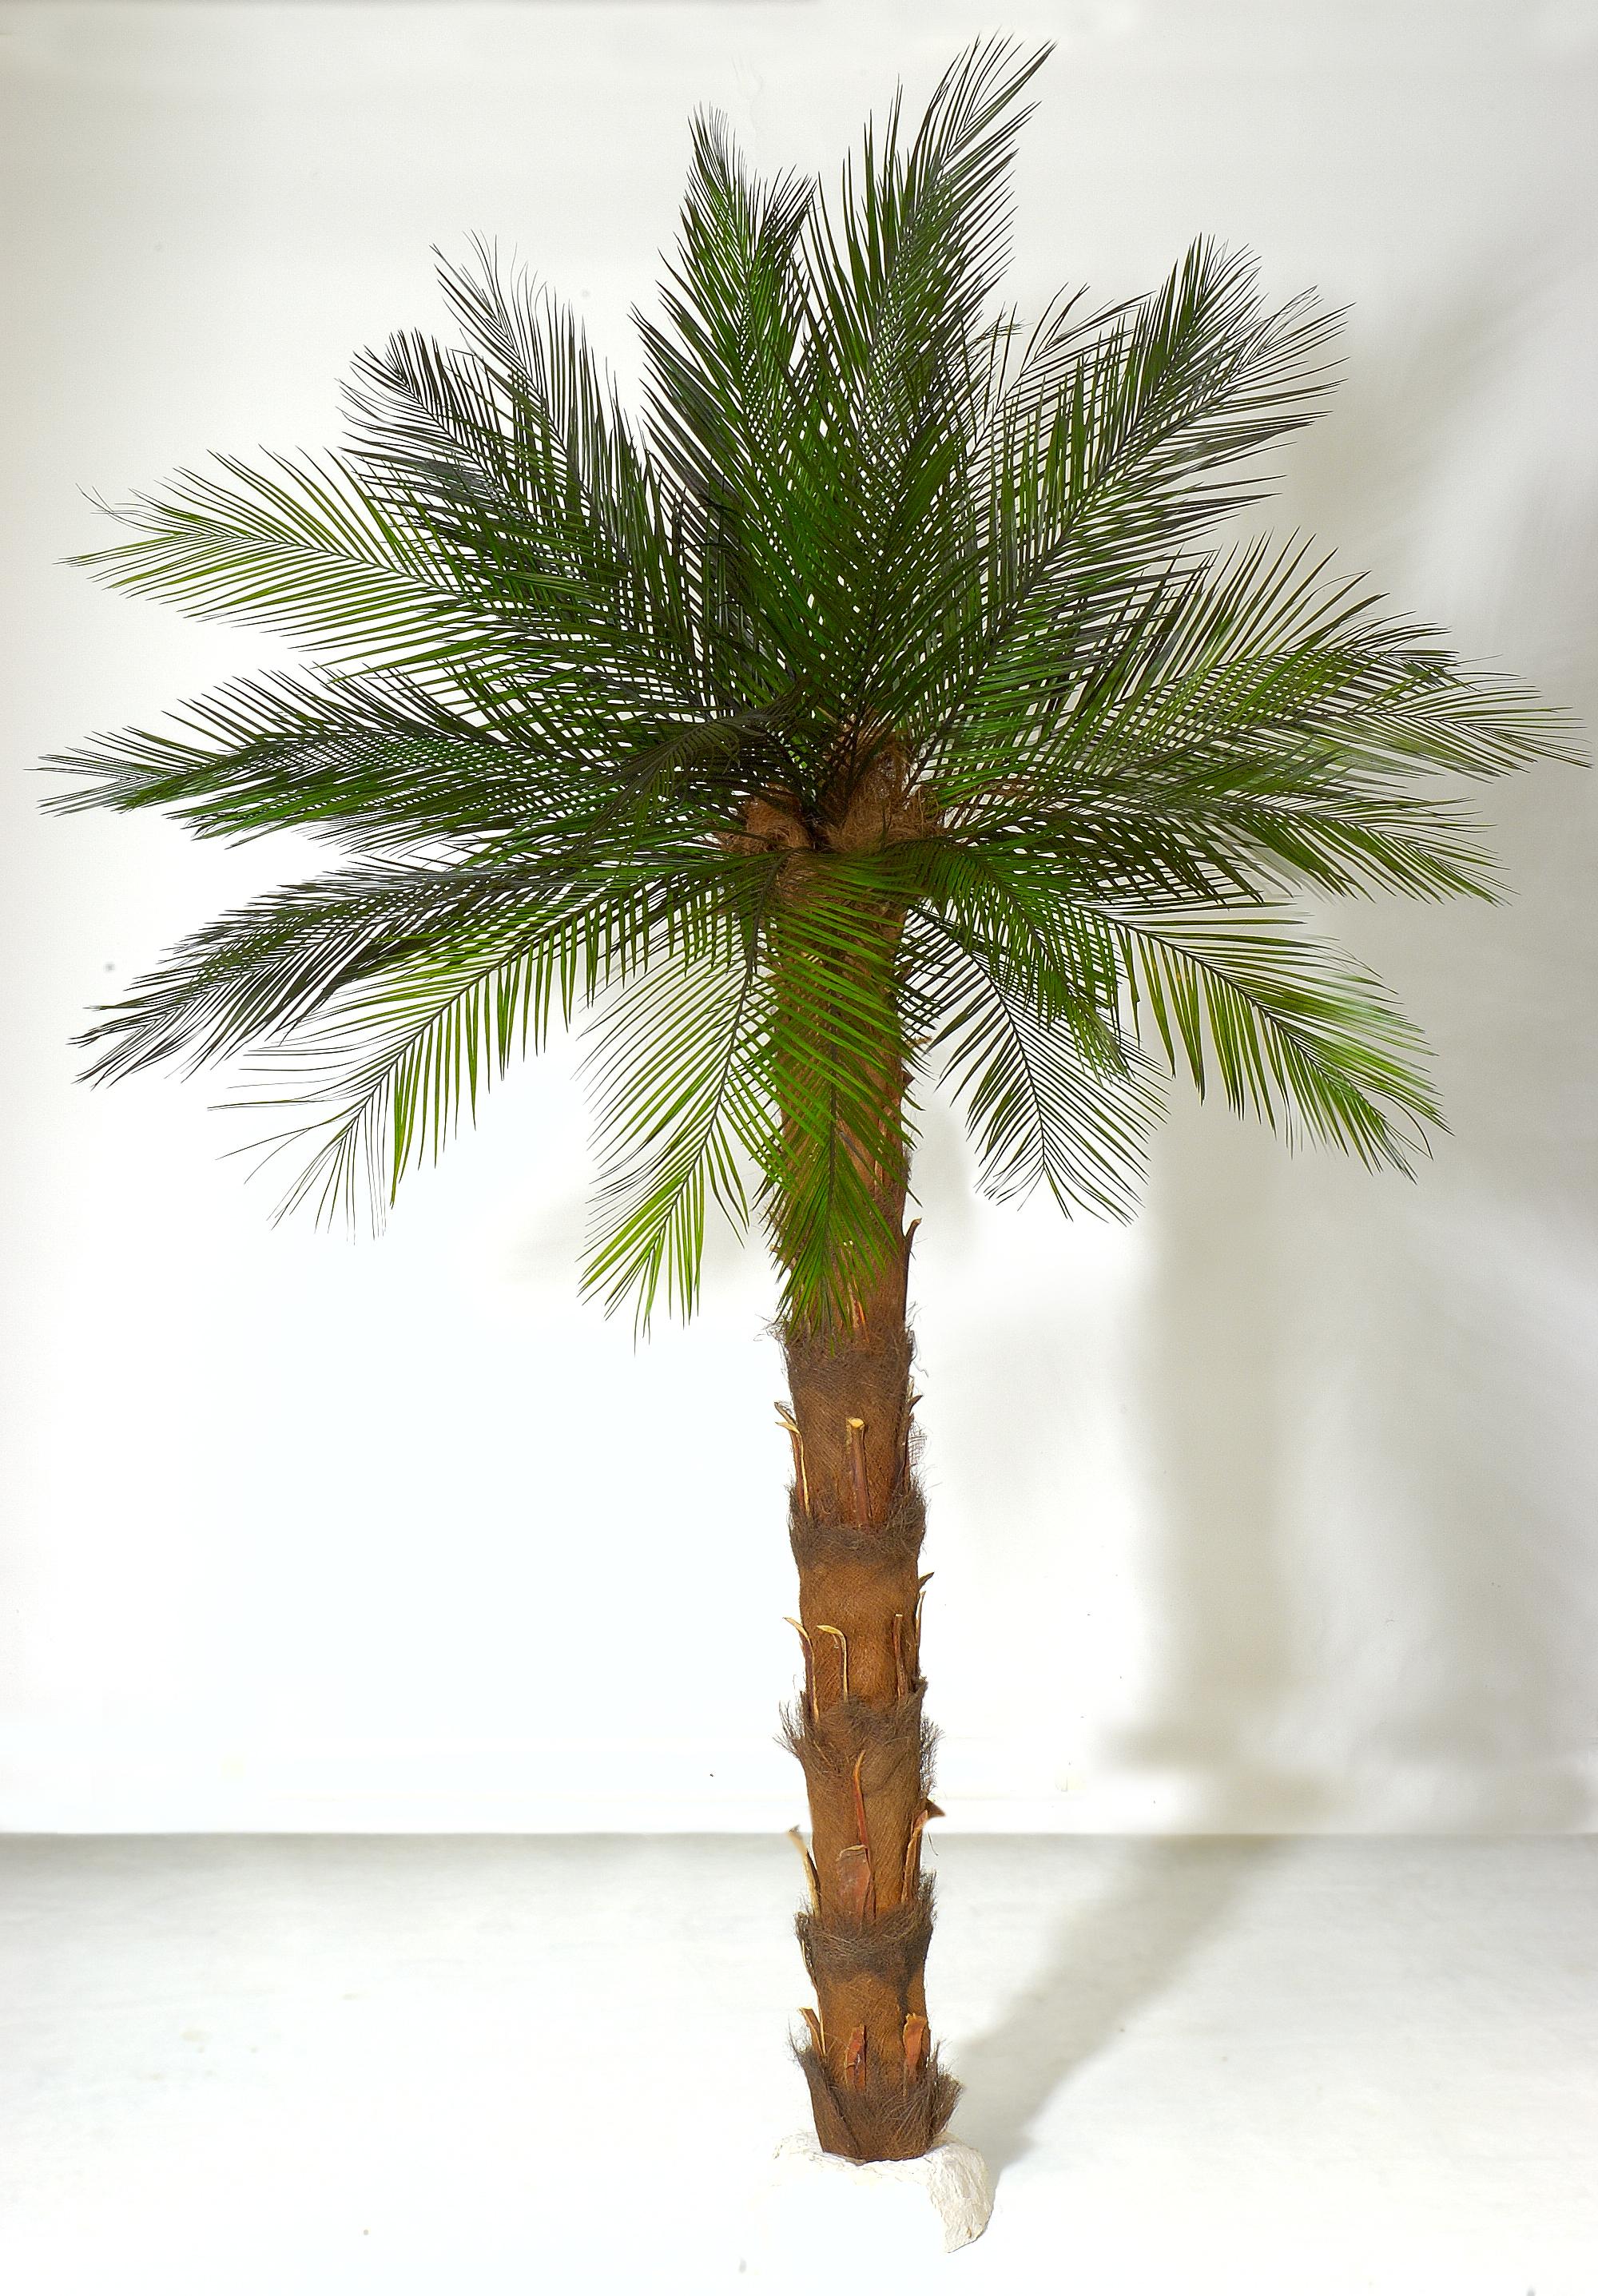 Palme basteln groß